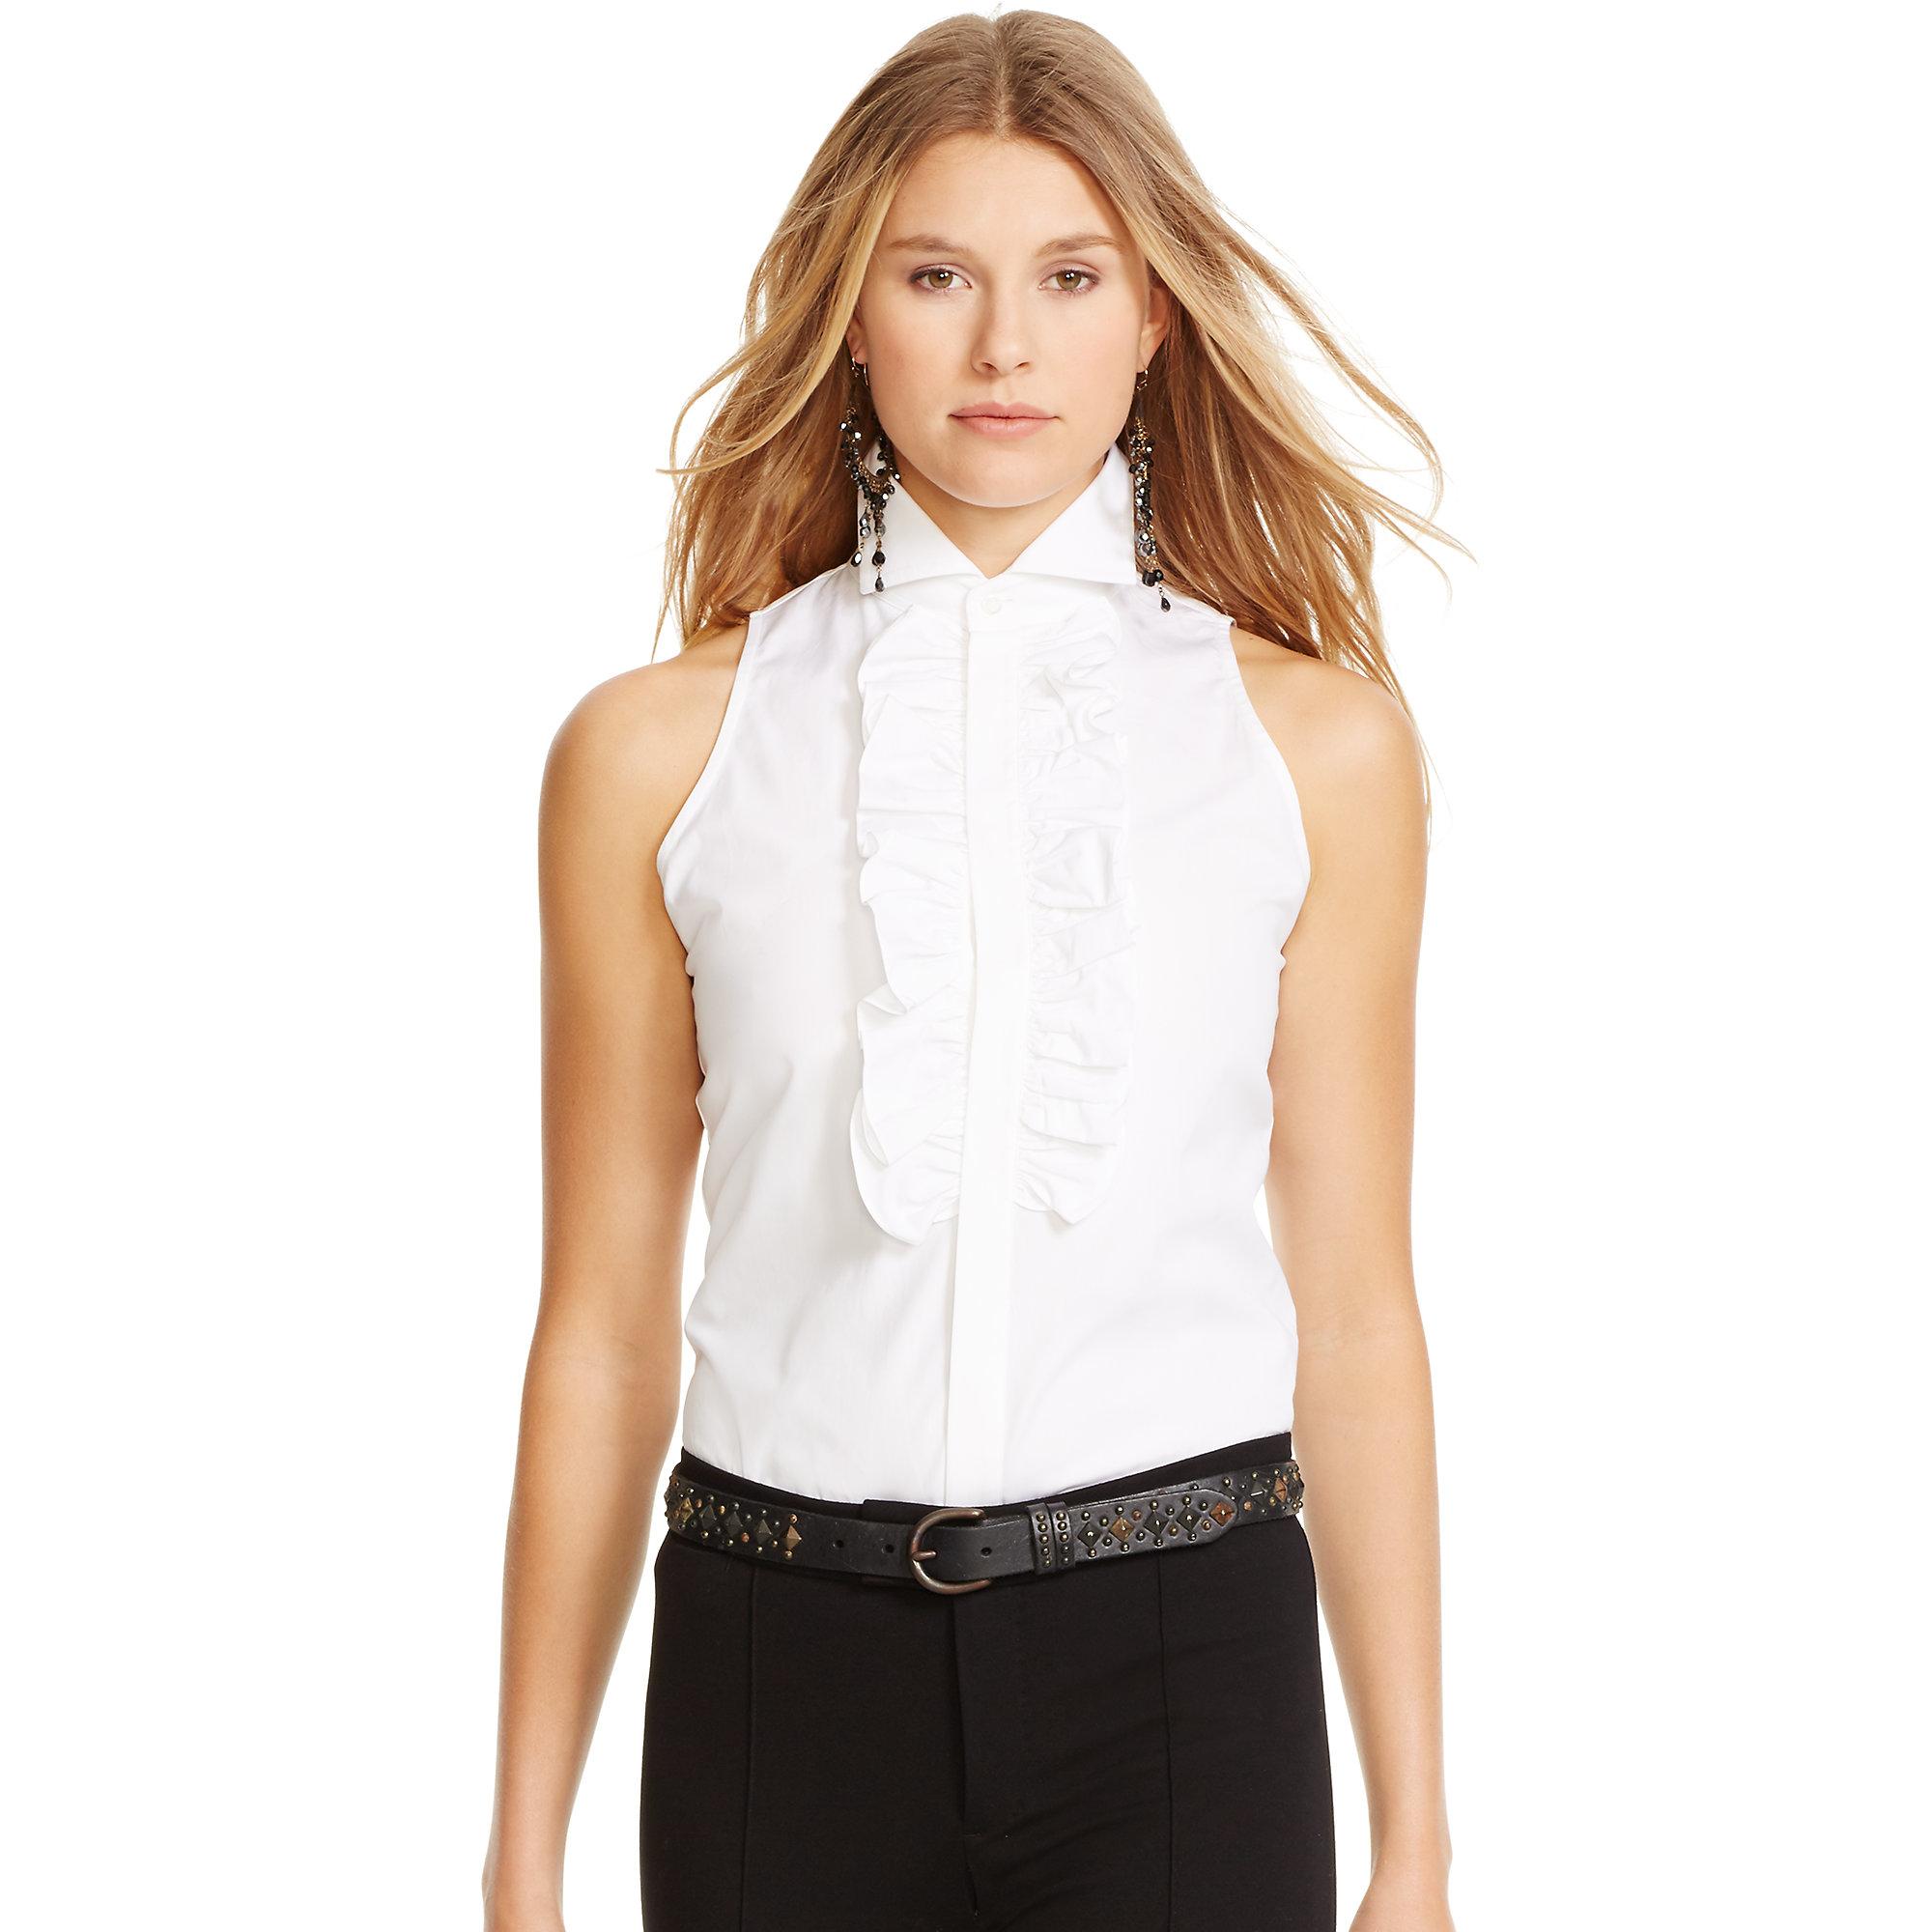 5a42fb0d758a0 Lyst - Polo Ralph Lauren Ruffled Sleeveless Shirt in White